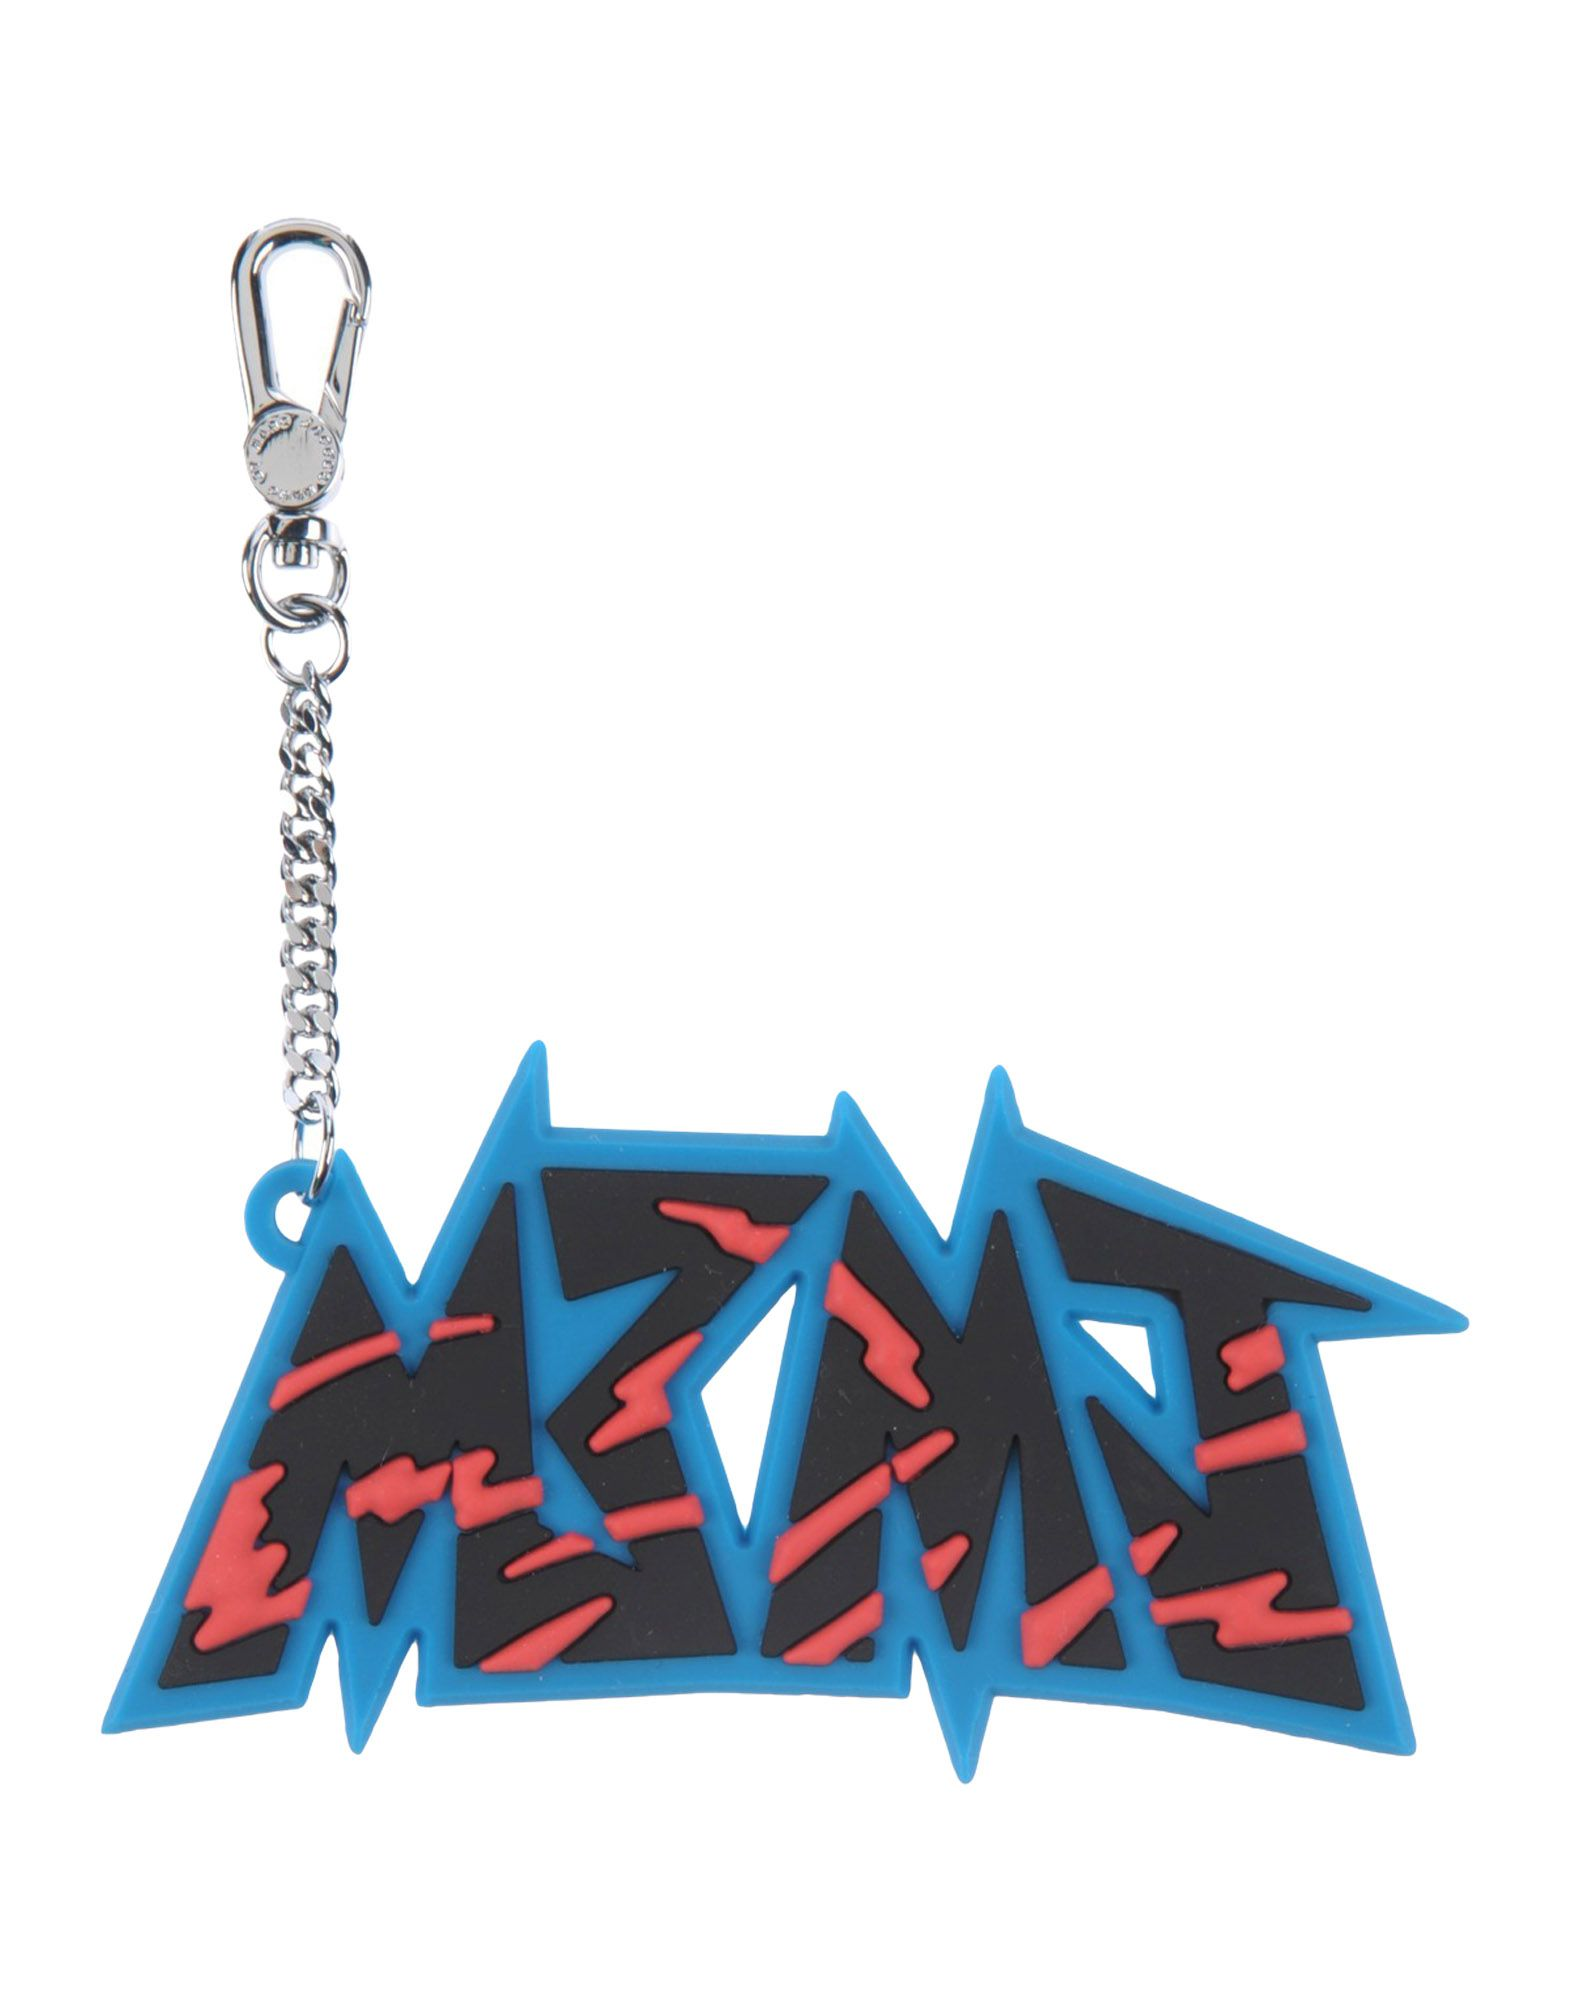 MARC BY MARC JACOBS Брелок для ключей скраб для лица marc inbane marc inbane скраб для лица marc inbane